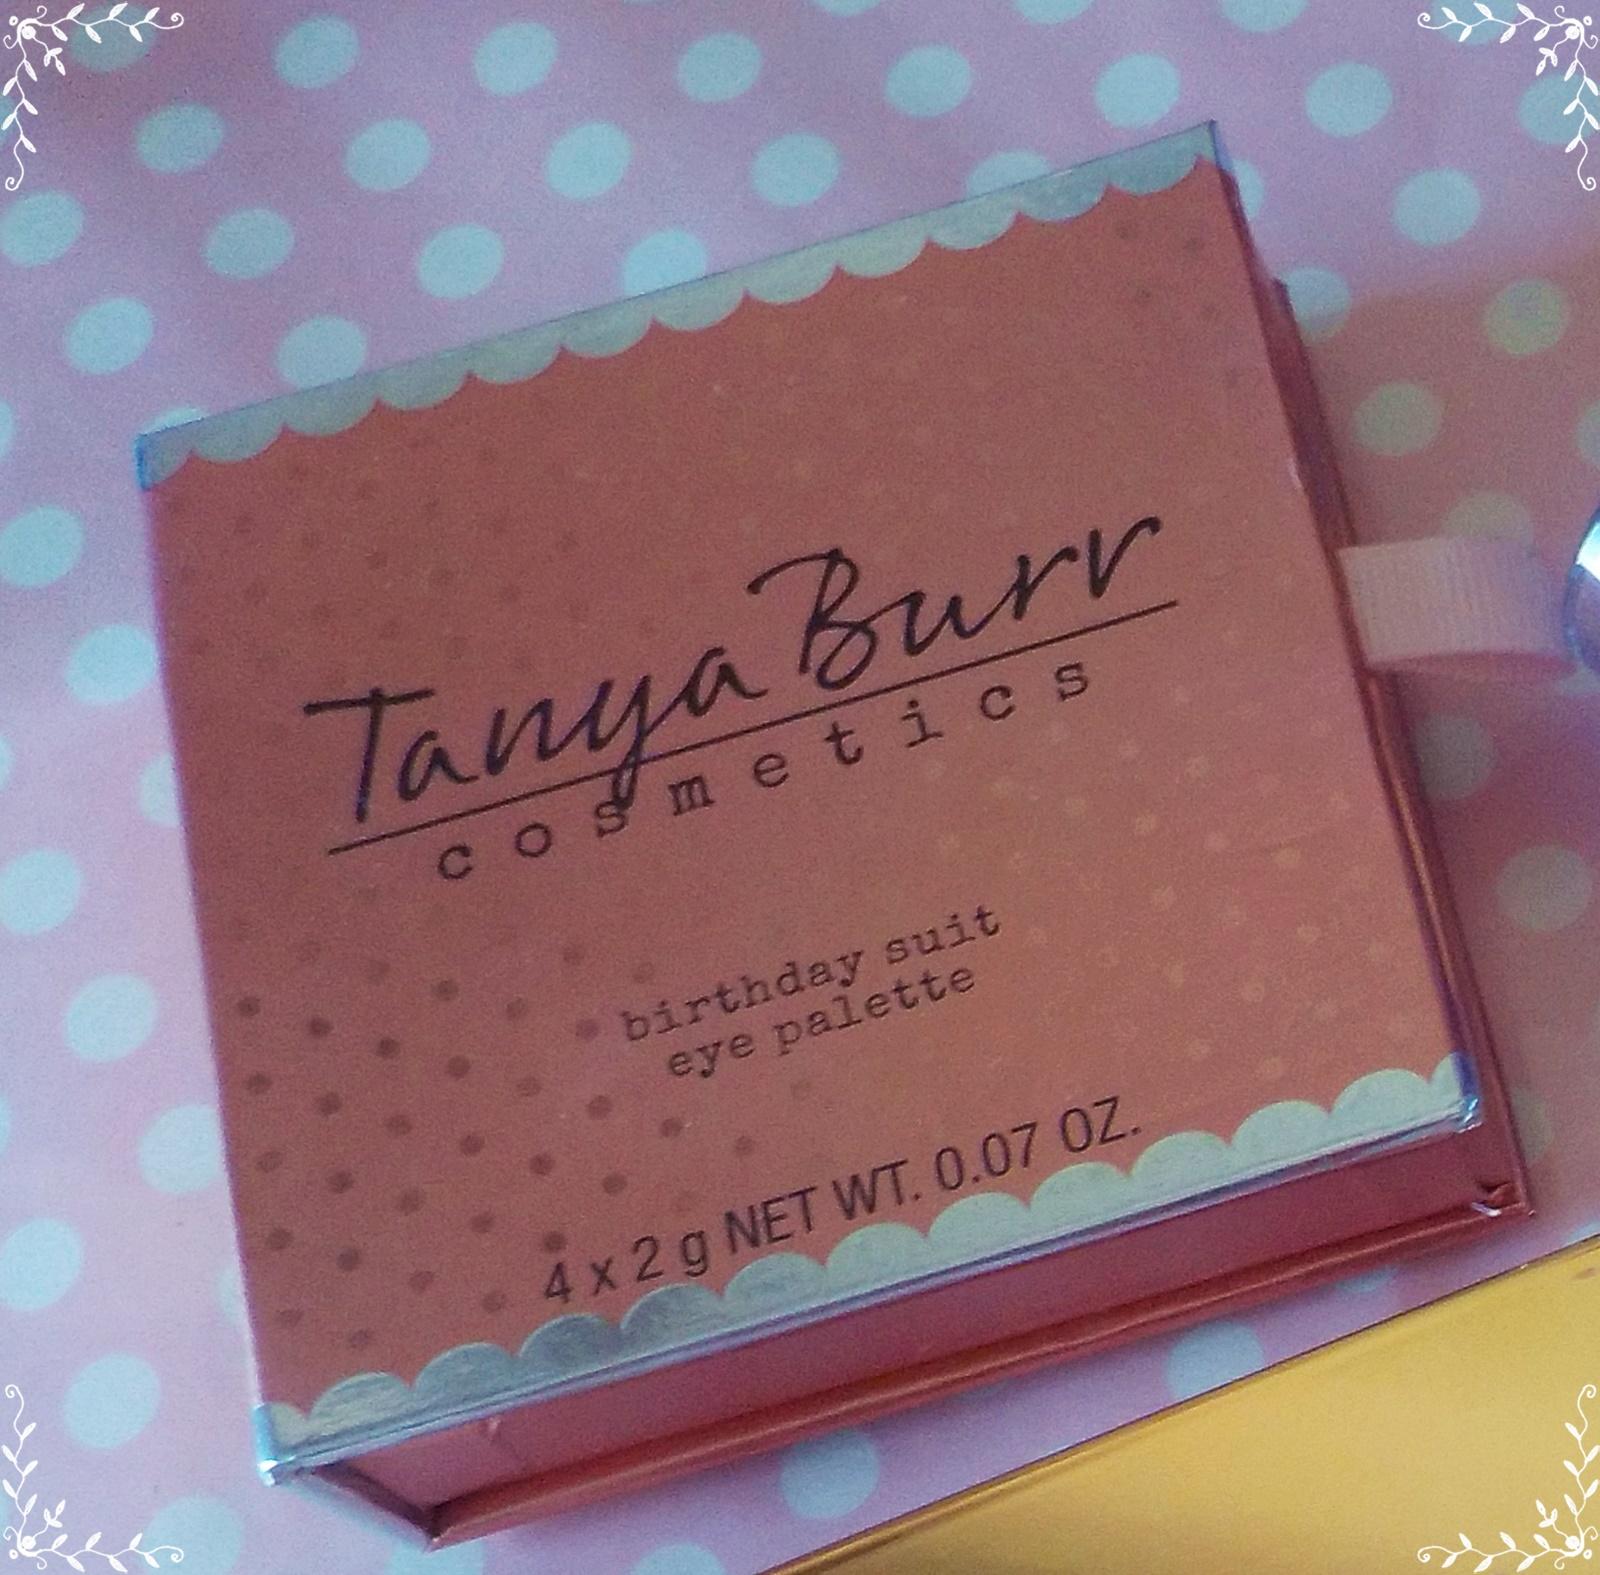 Tanya Burr Birthday Cake Lipstick